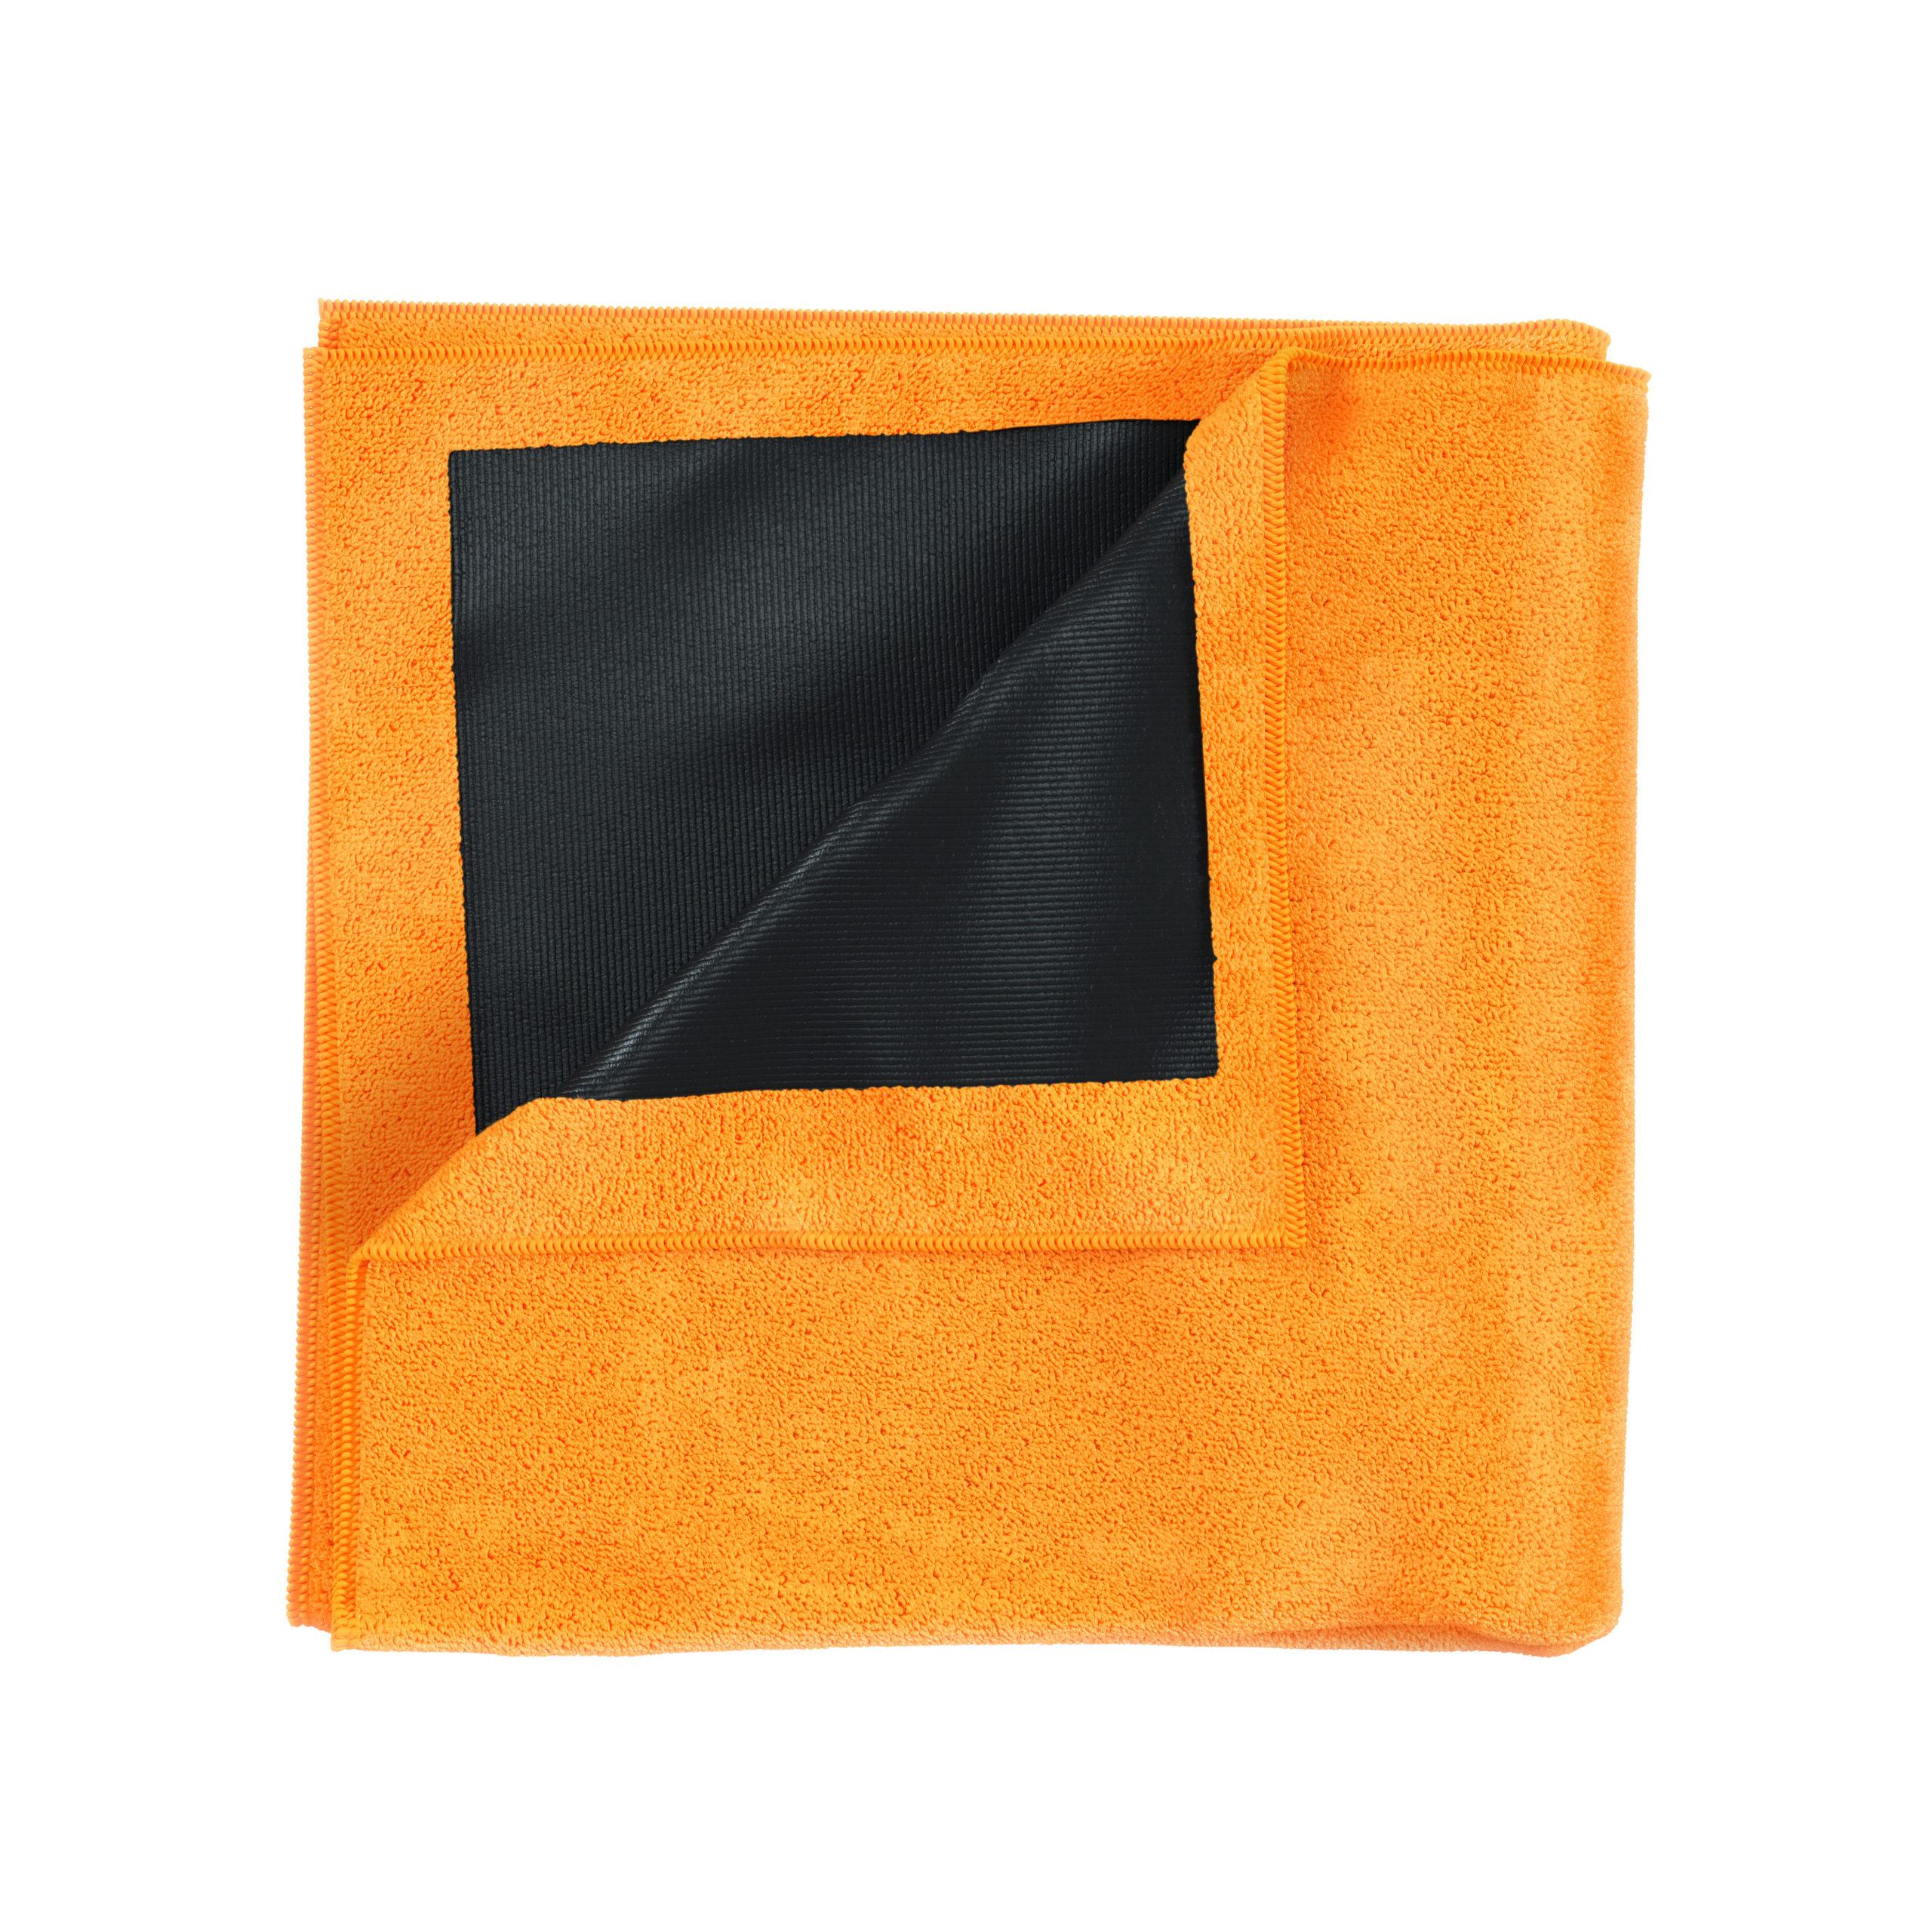 ADBL CLAY TOWEL